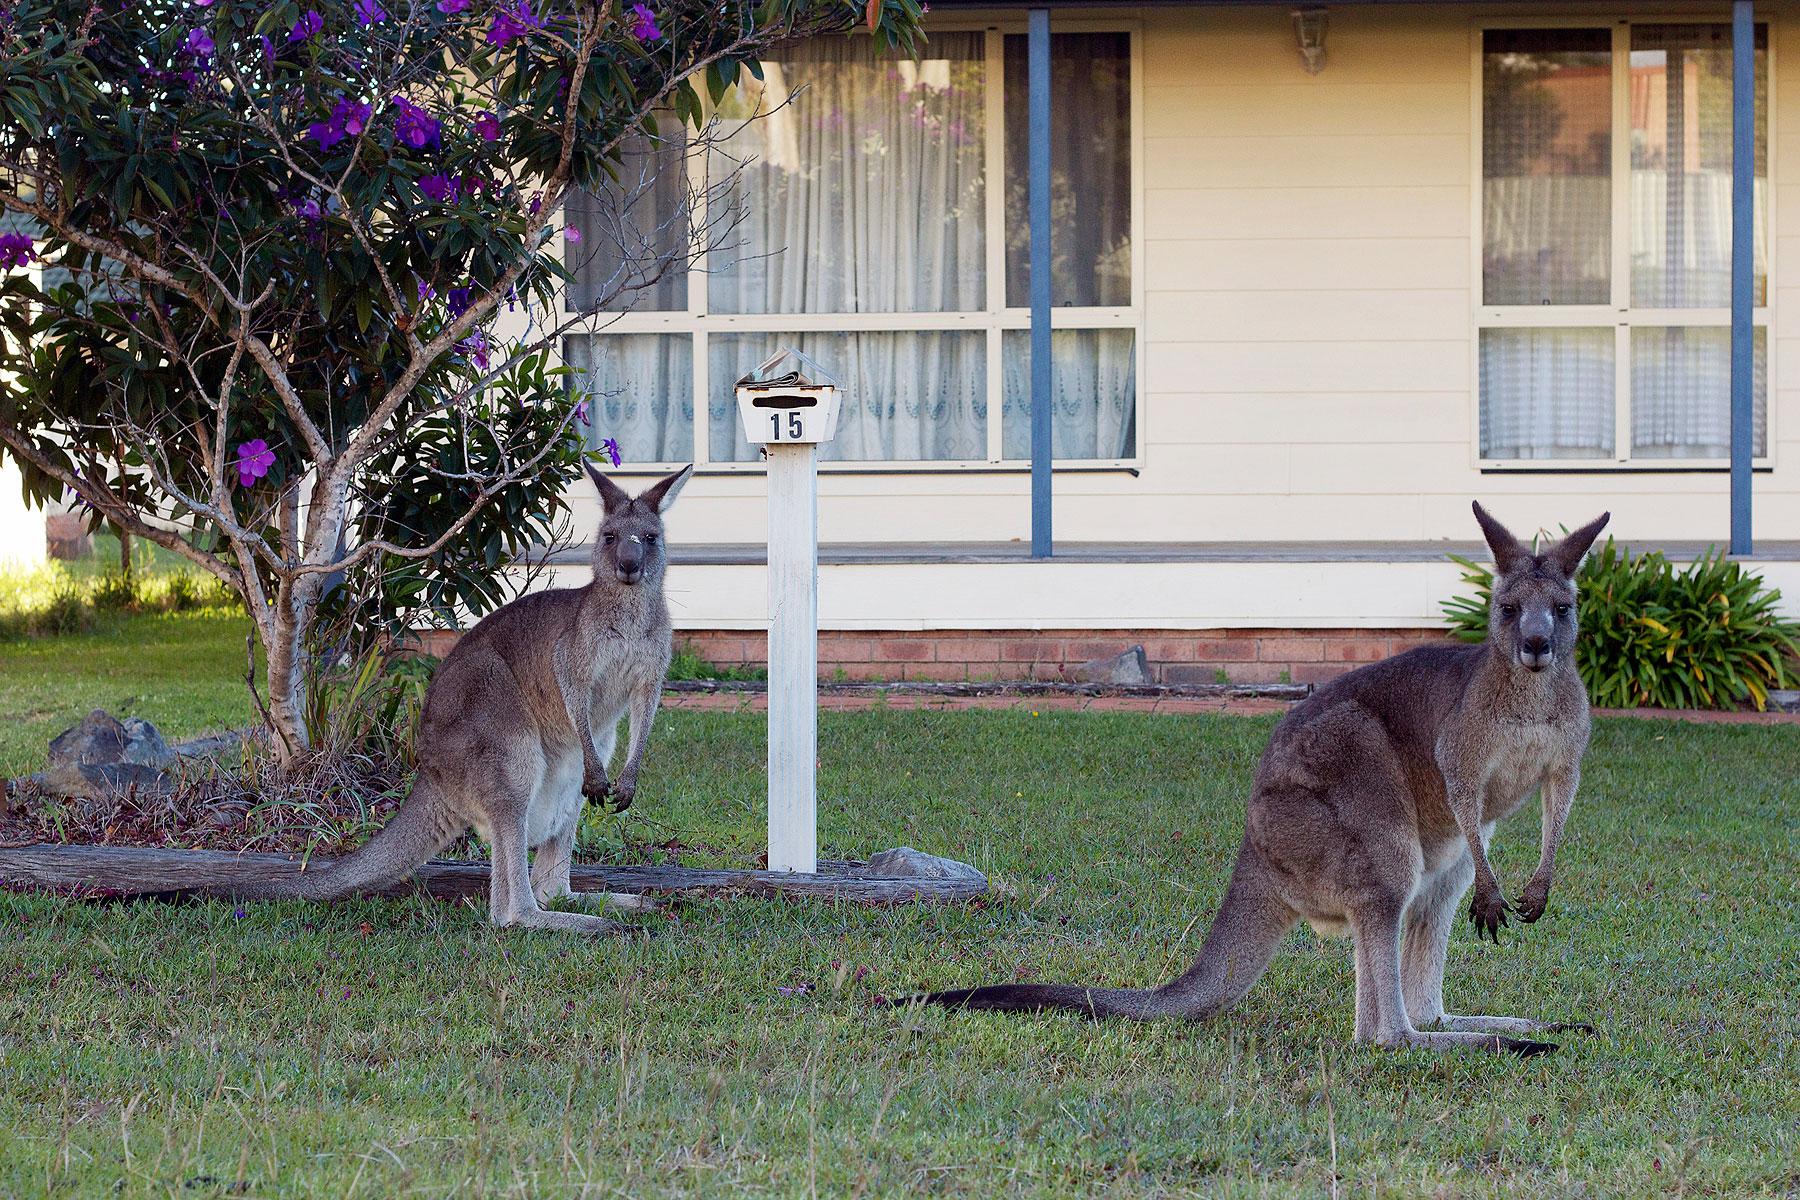 Eastern gray kangaroos graze near Canberra